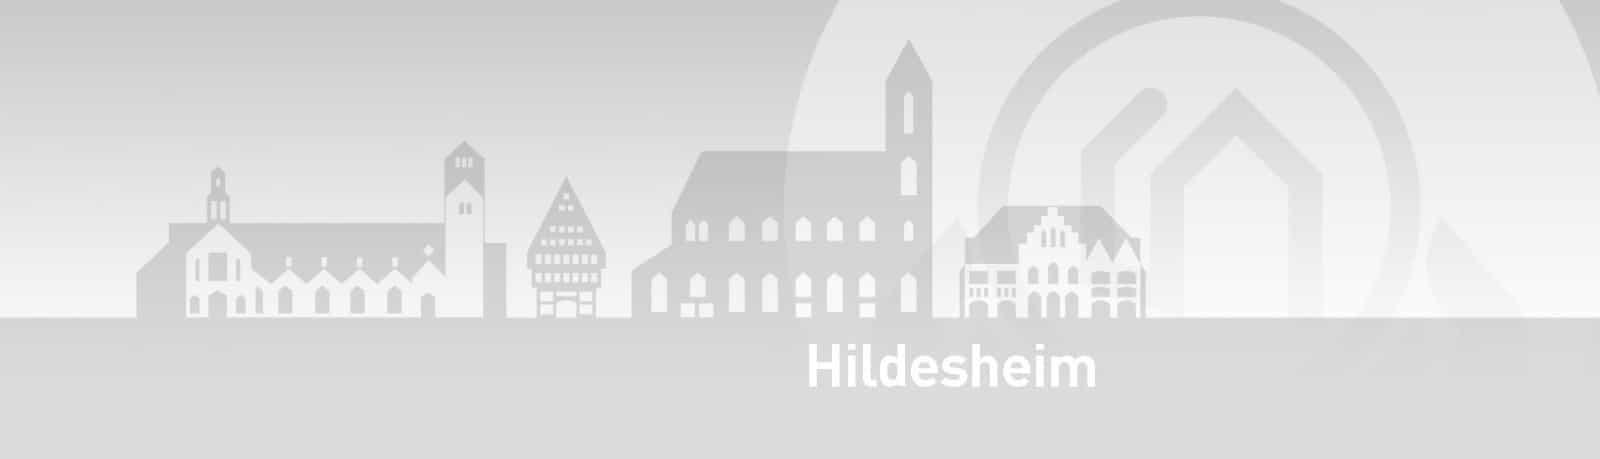 Hildesheim SENCURINA 1904x546 - Hildesheim